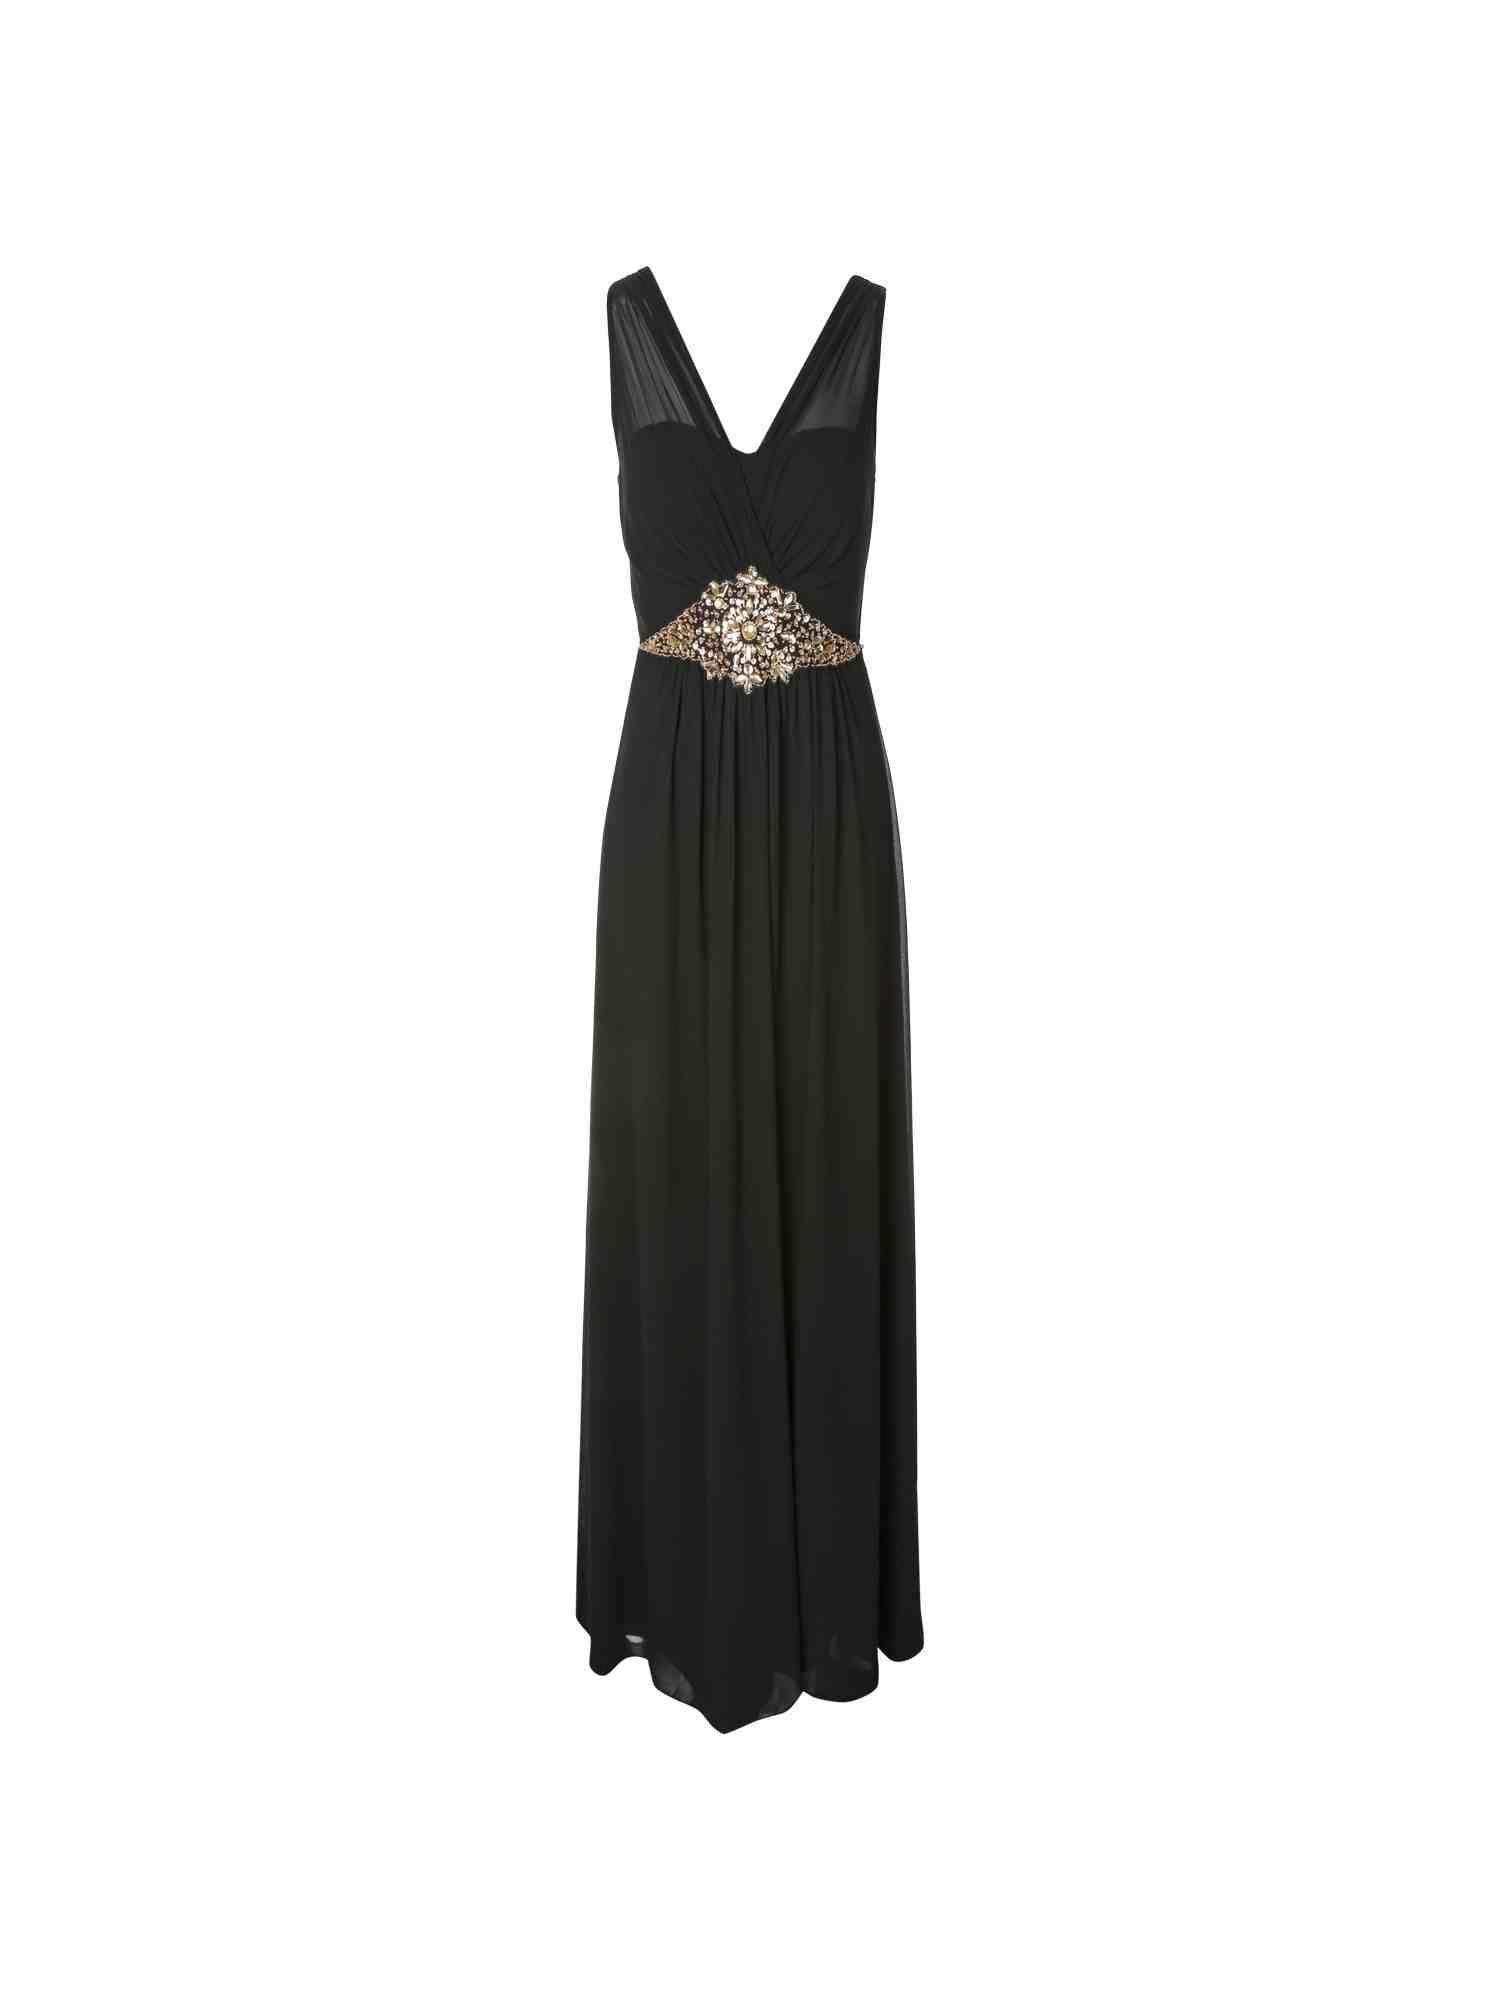 Embellished Cross Over Maxi Dress Jane Norman Wedding Guest Dress Dresses Maxi Dress